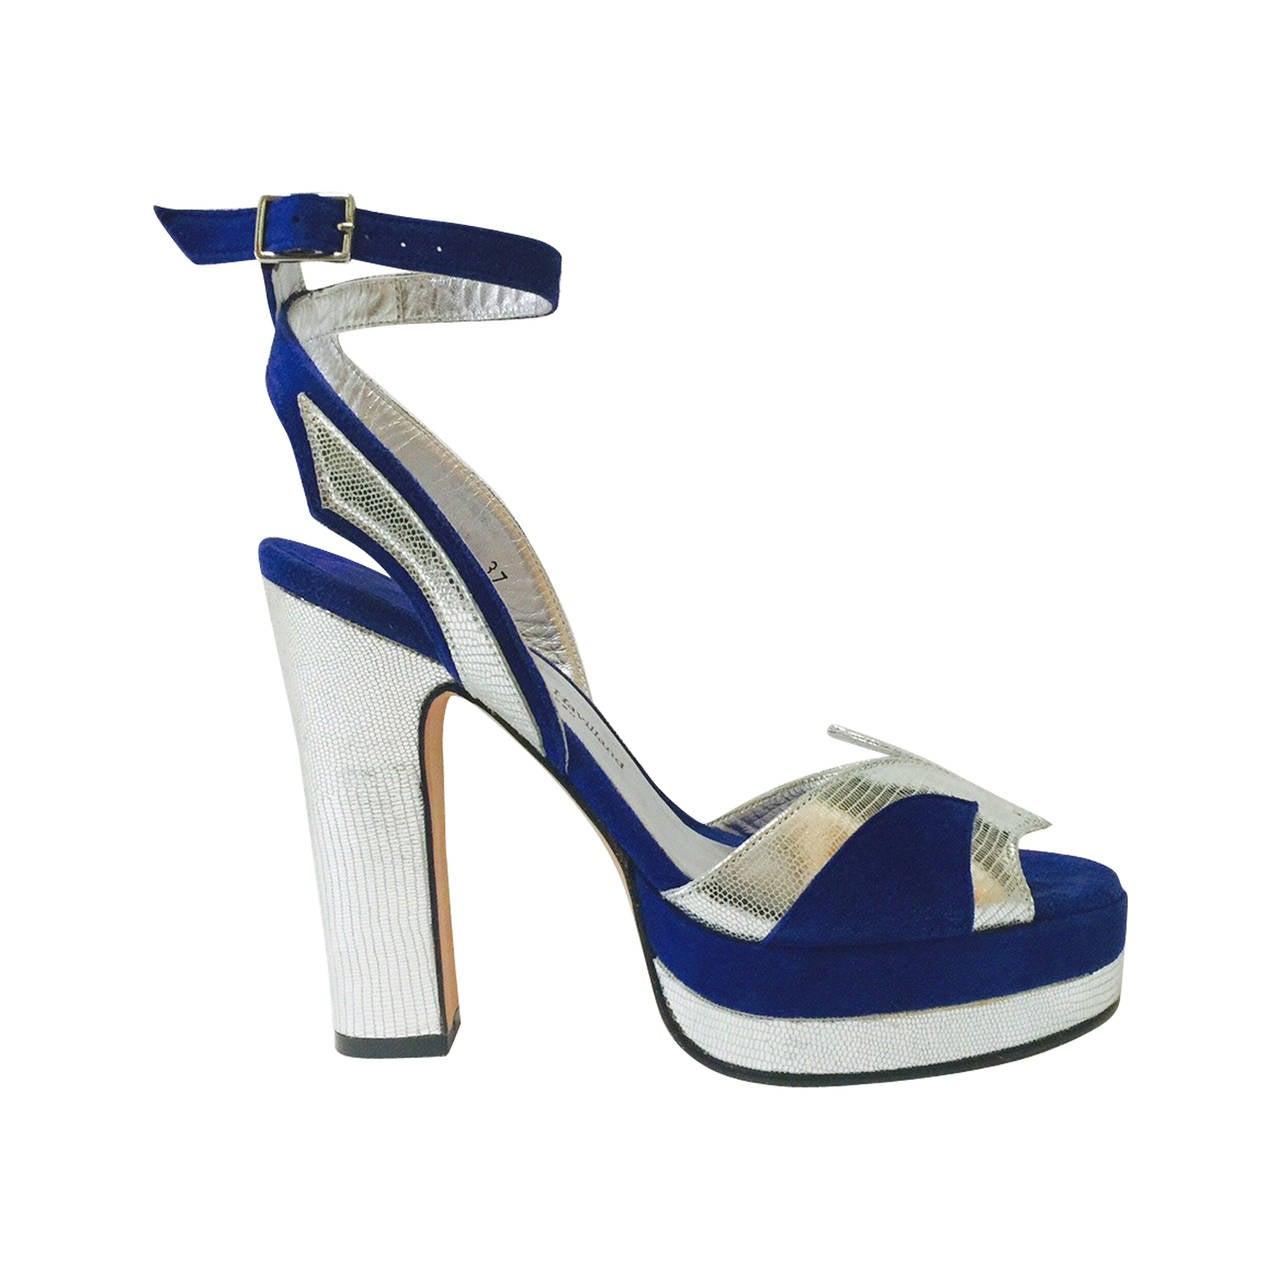 New Terry de Havilland Blue Suede Platform Stacked High Heel Sandals For Sale